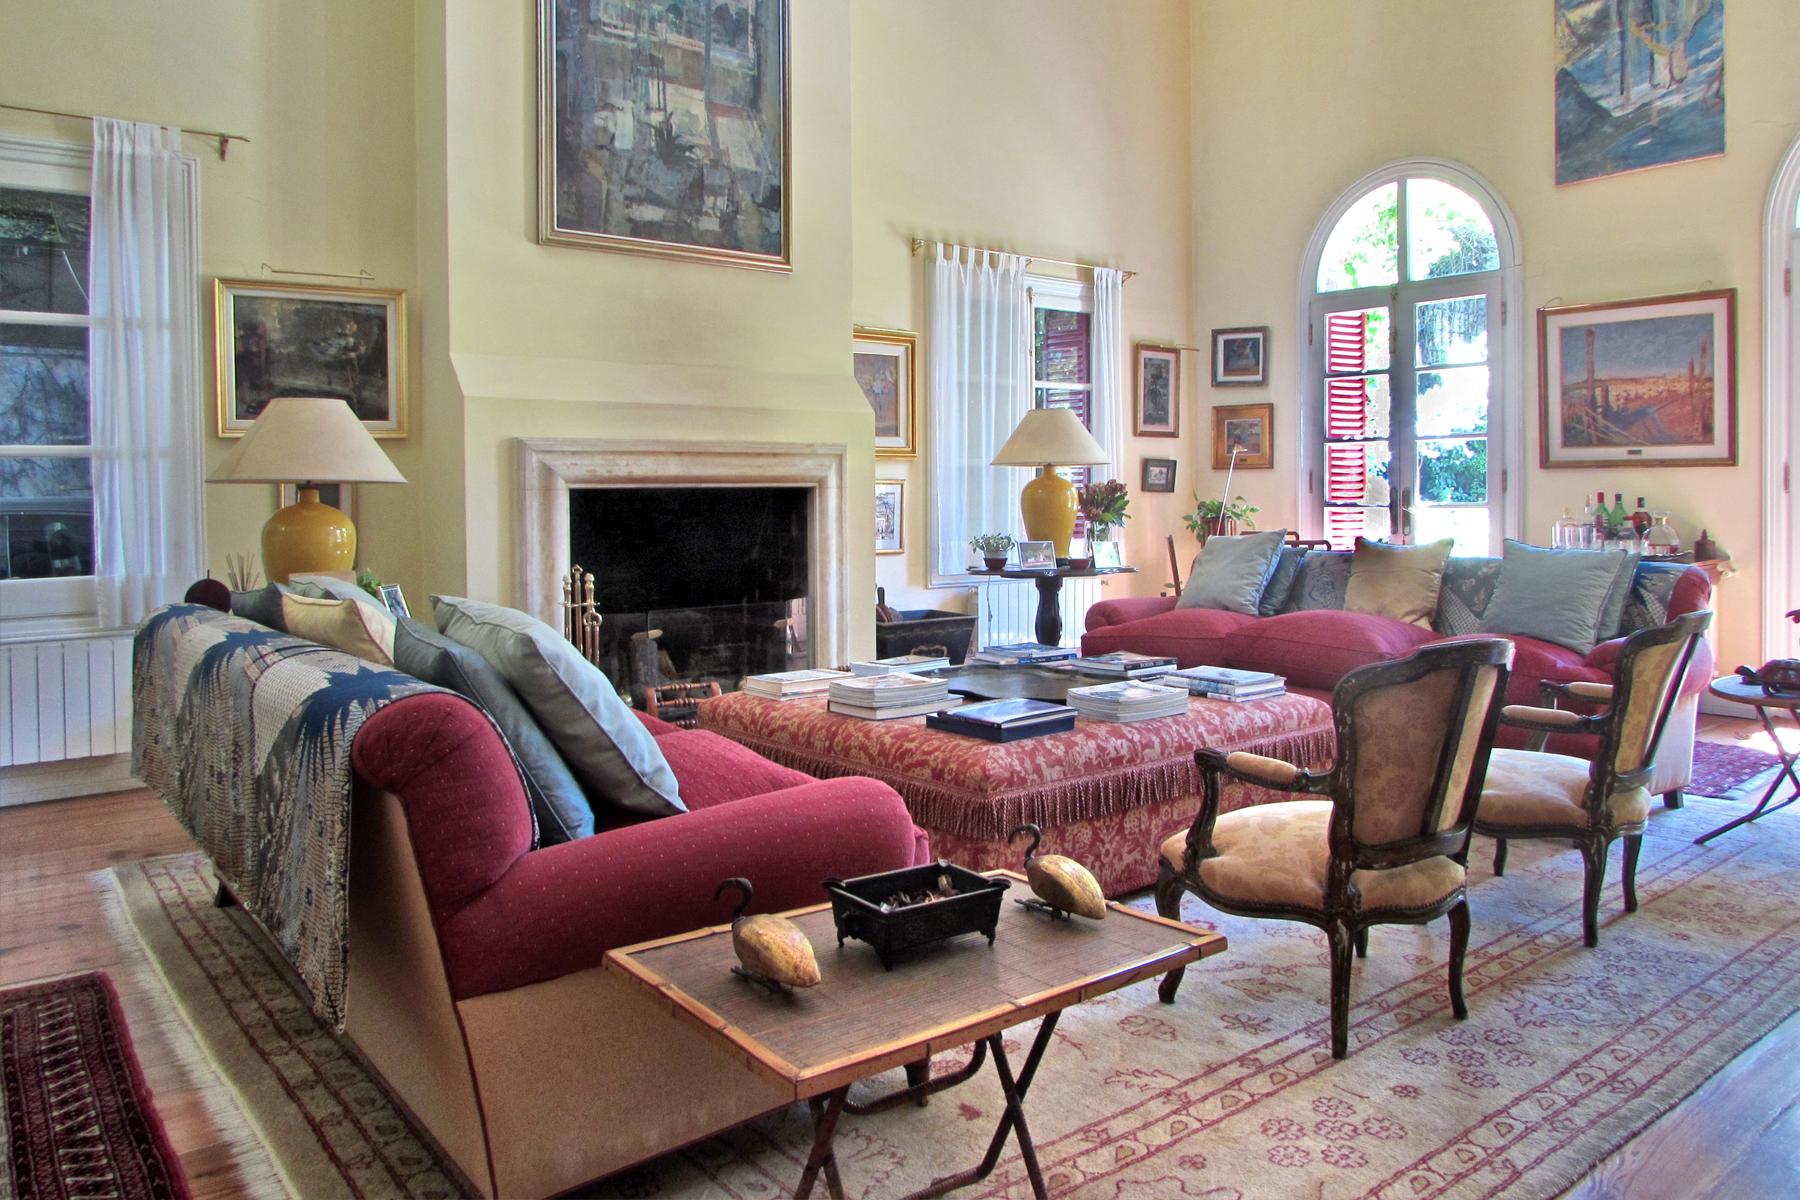 Property Of Amazing House in Belgano - Dragones 1900